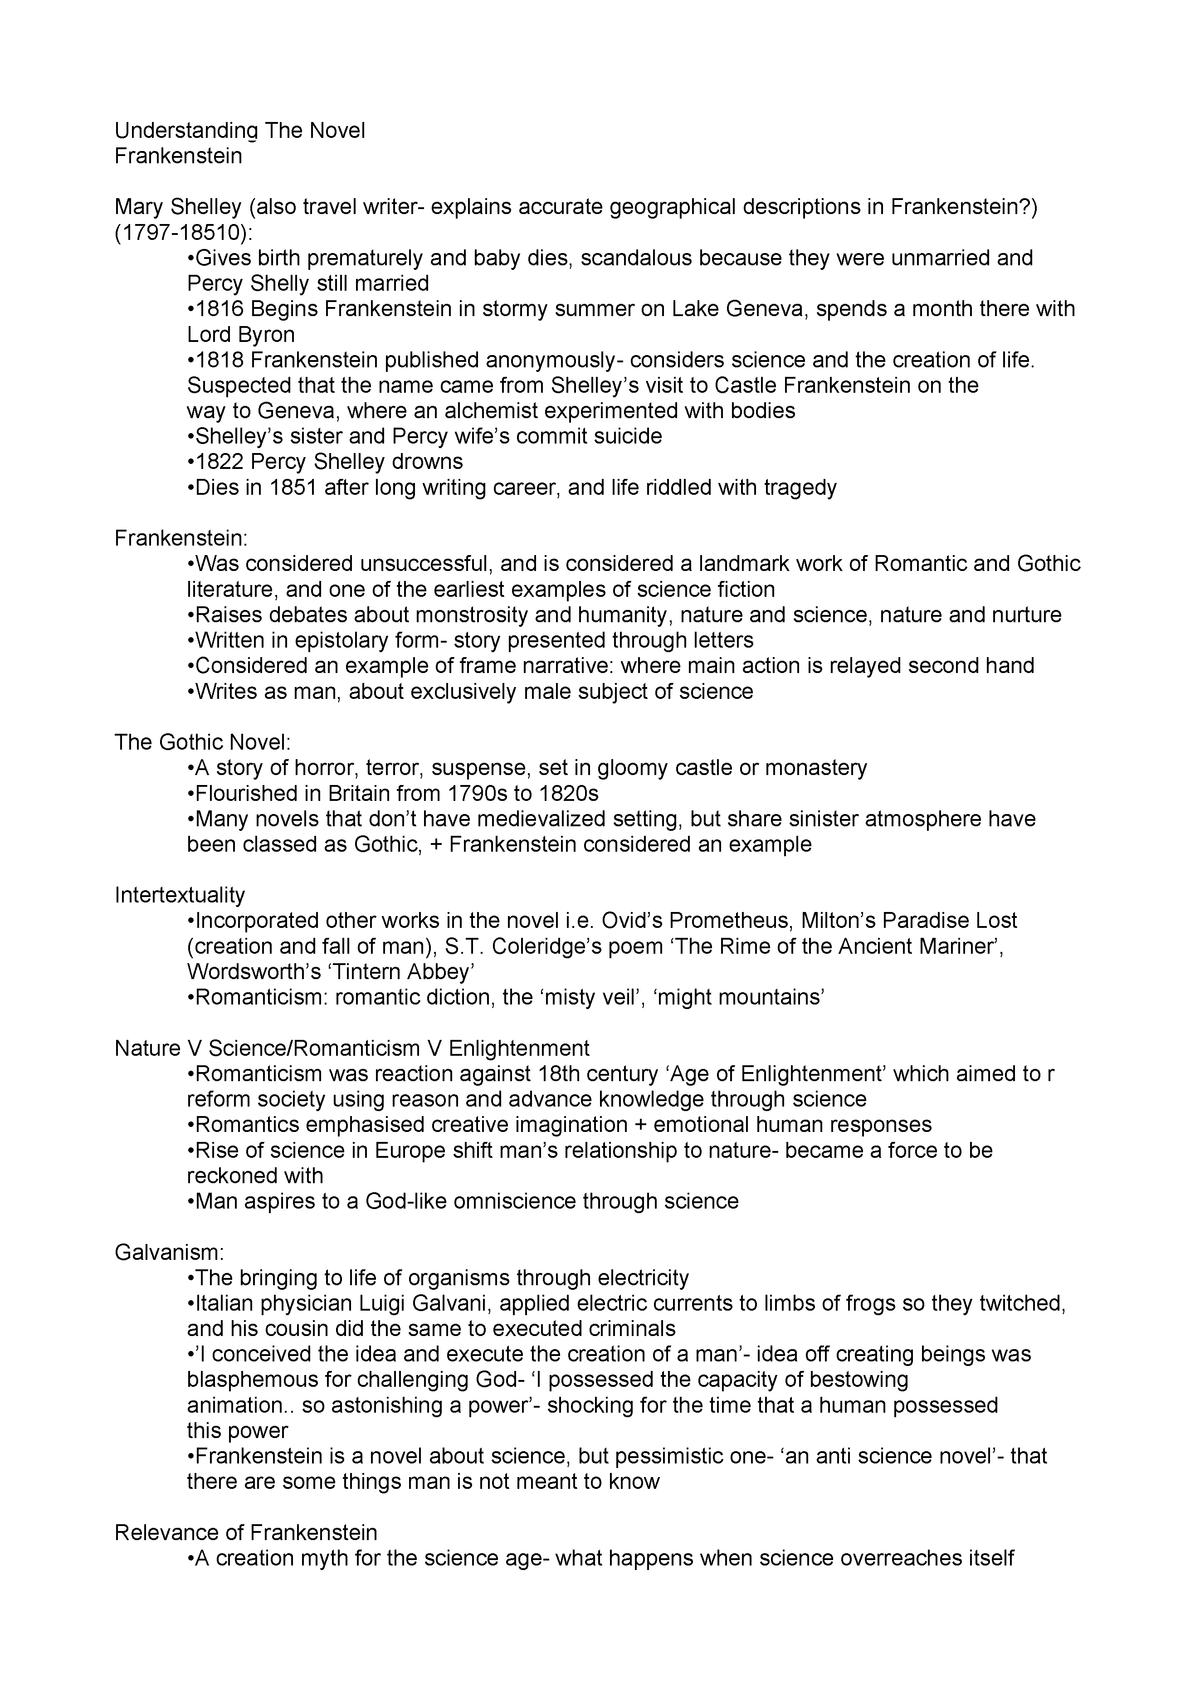 Frankenstein - Lecture notes 1 - ELI1025: UNDERSTANDING THE NOVEL